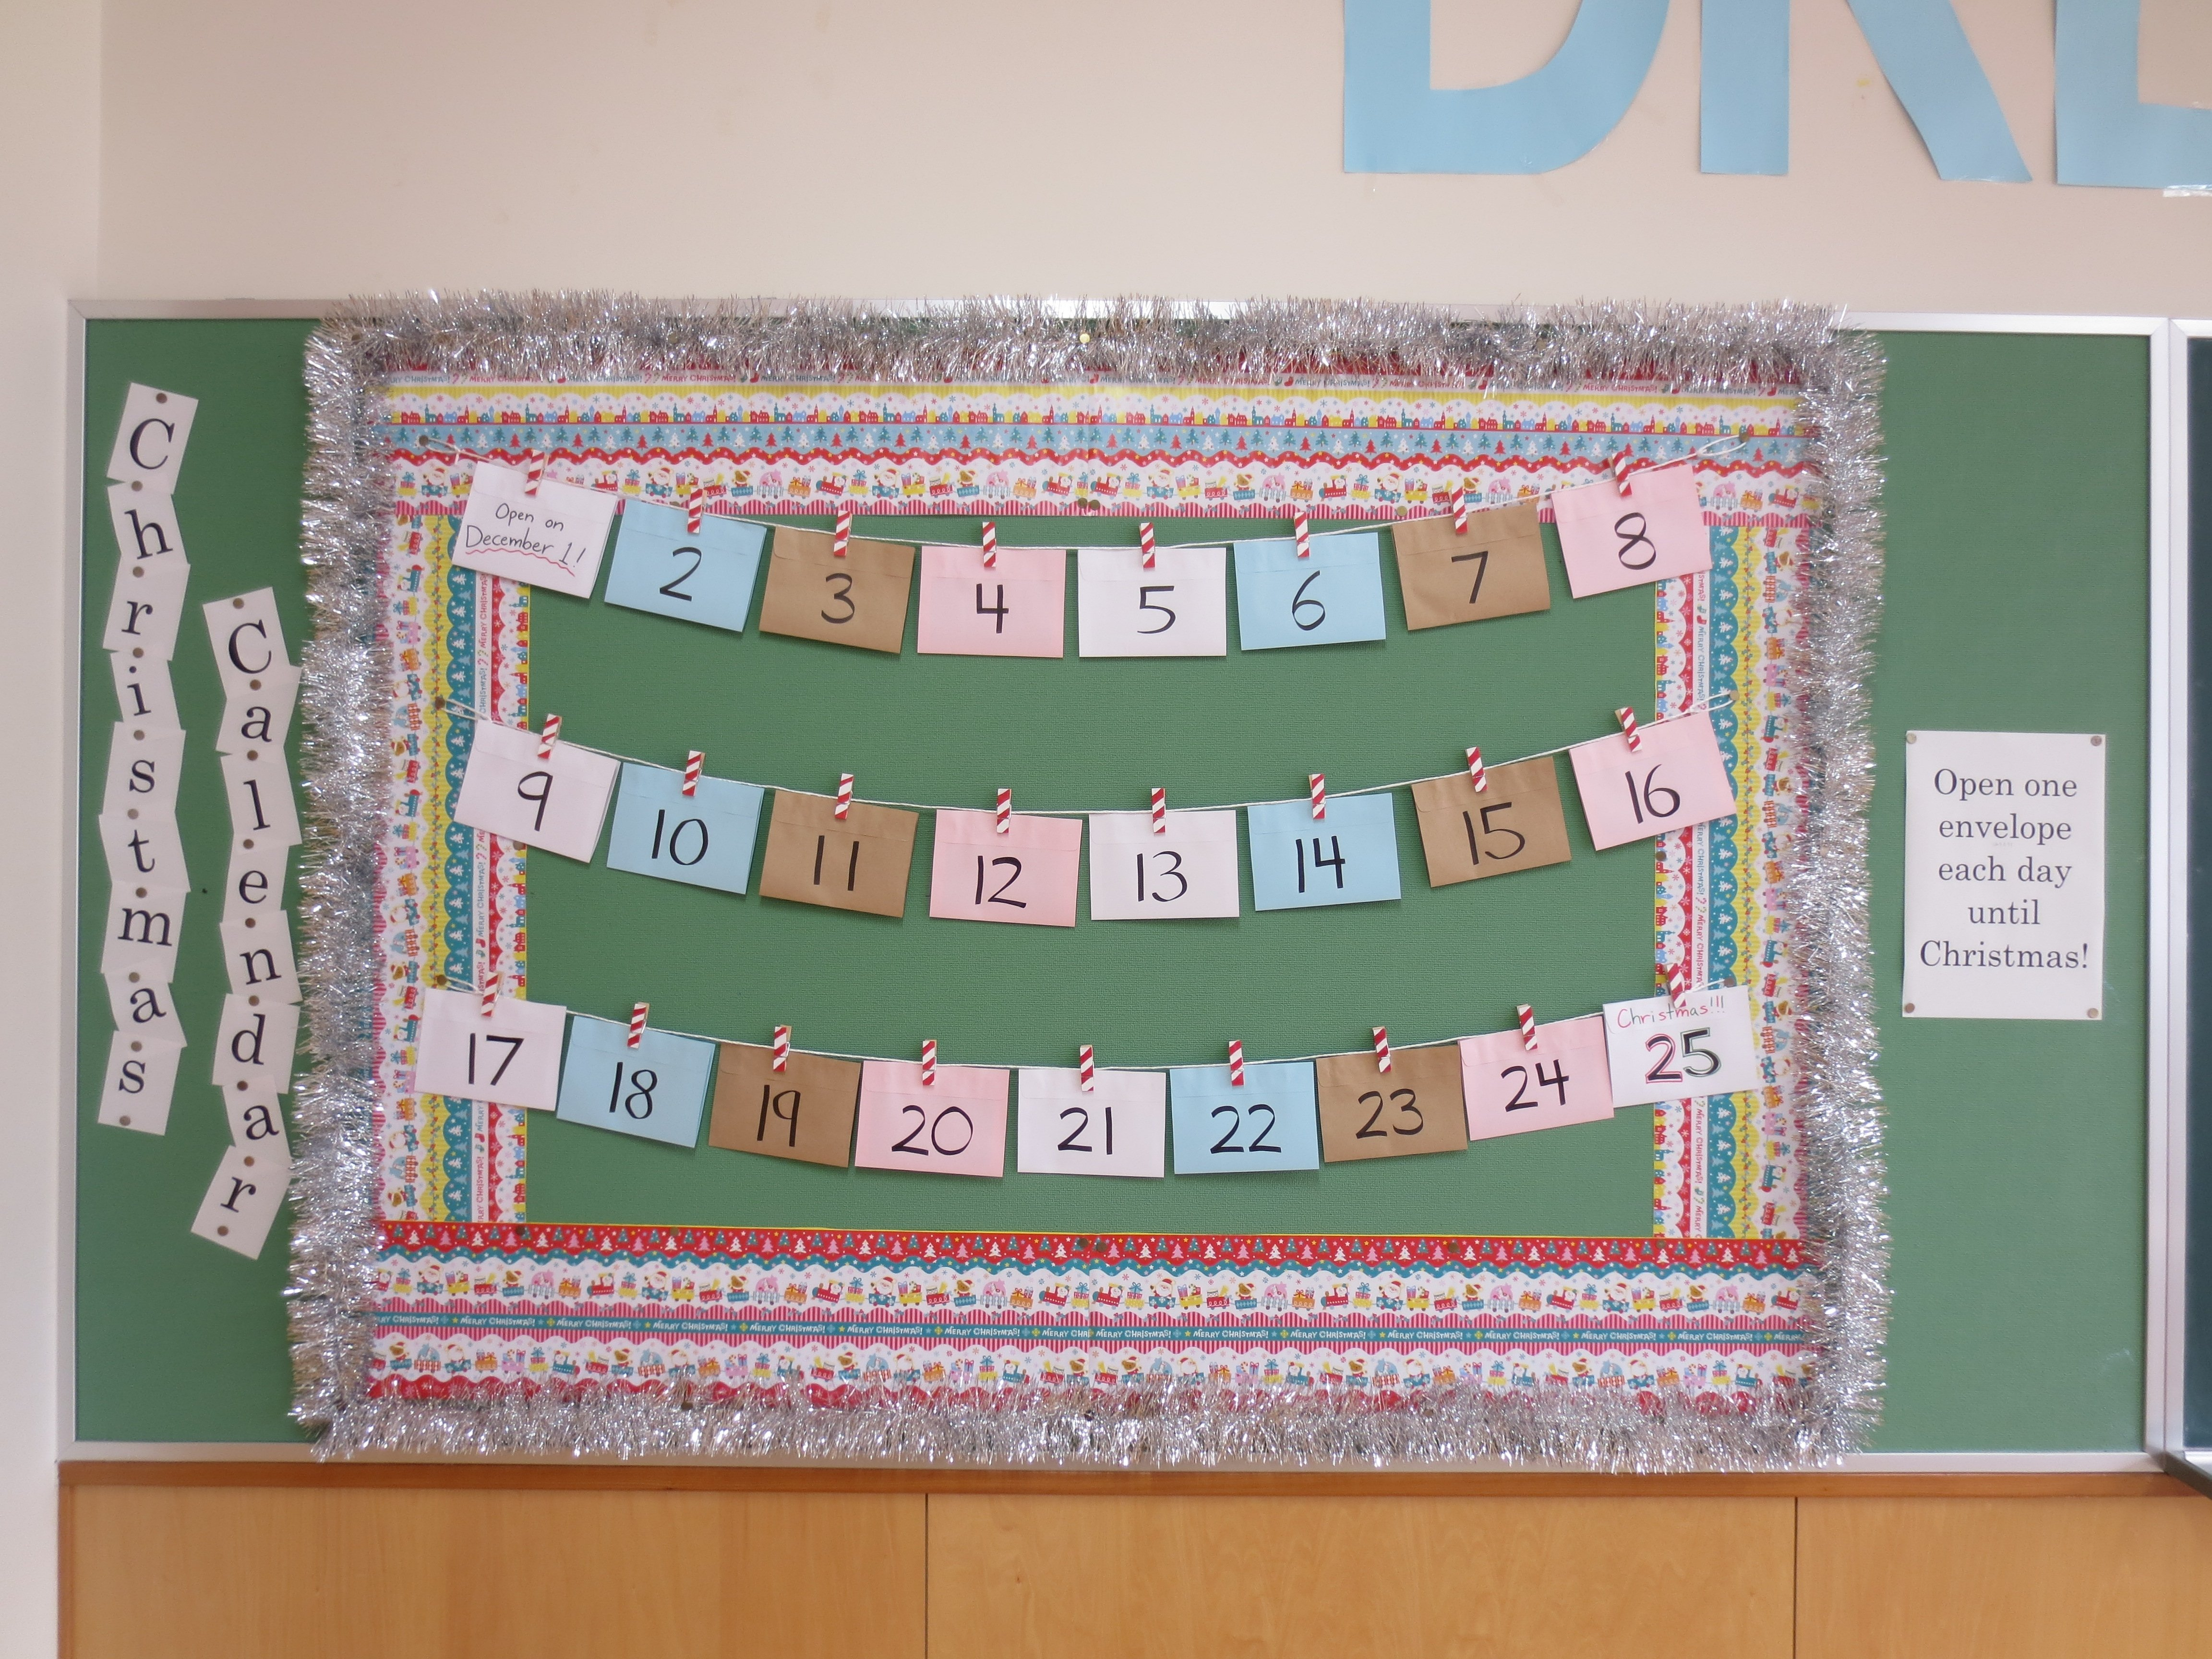 10 Lovable Bulletin Board Ideas Middle School simple english bulletin board ideas e7b4a0e695b5e381aae383a9e382a4e38395 4 2020